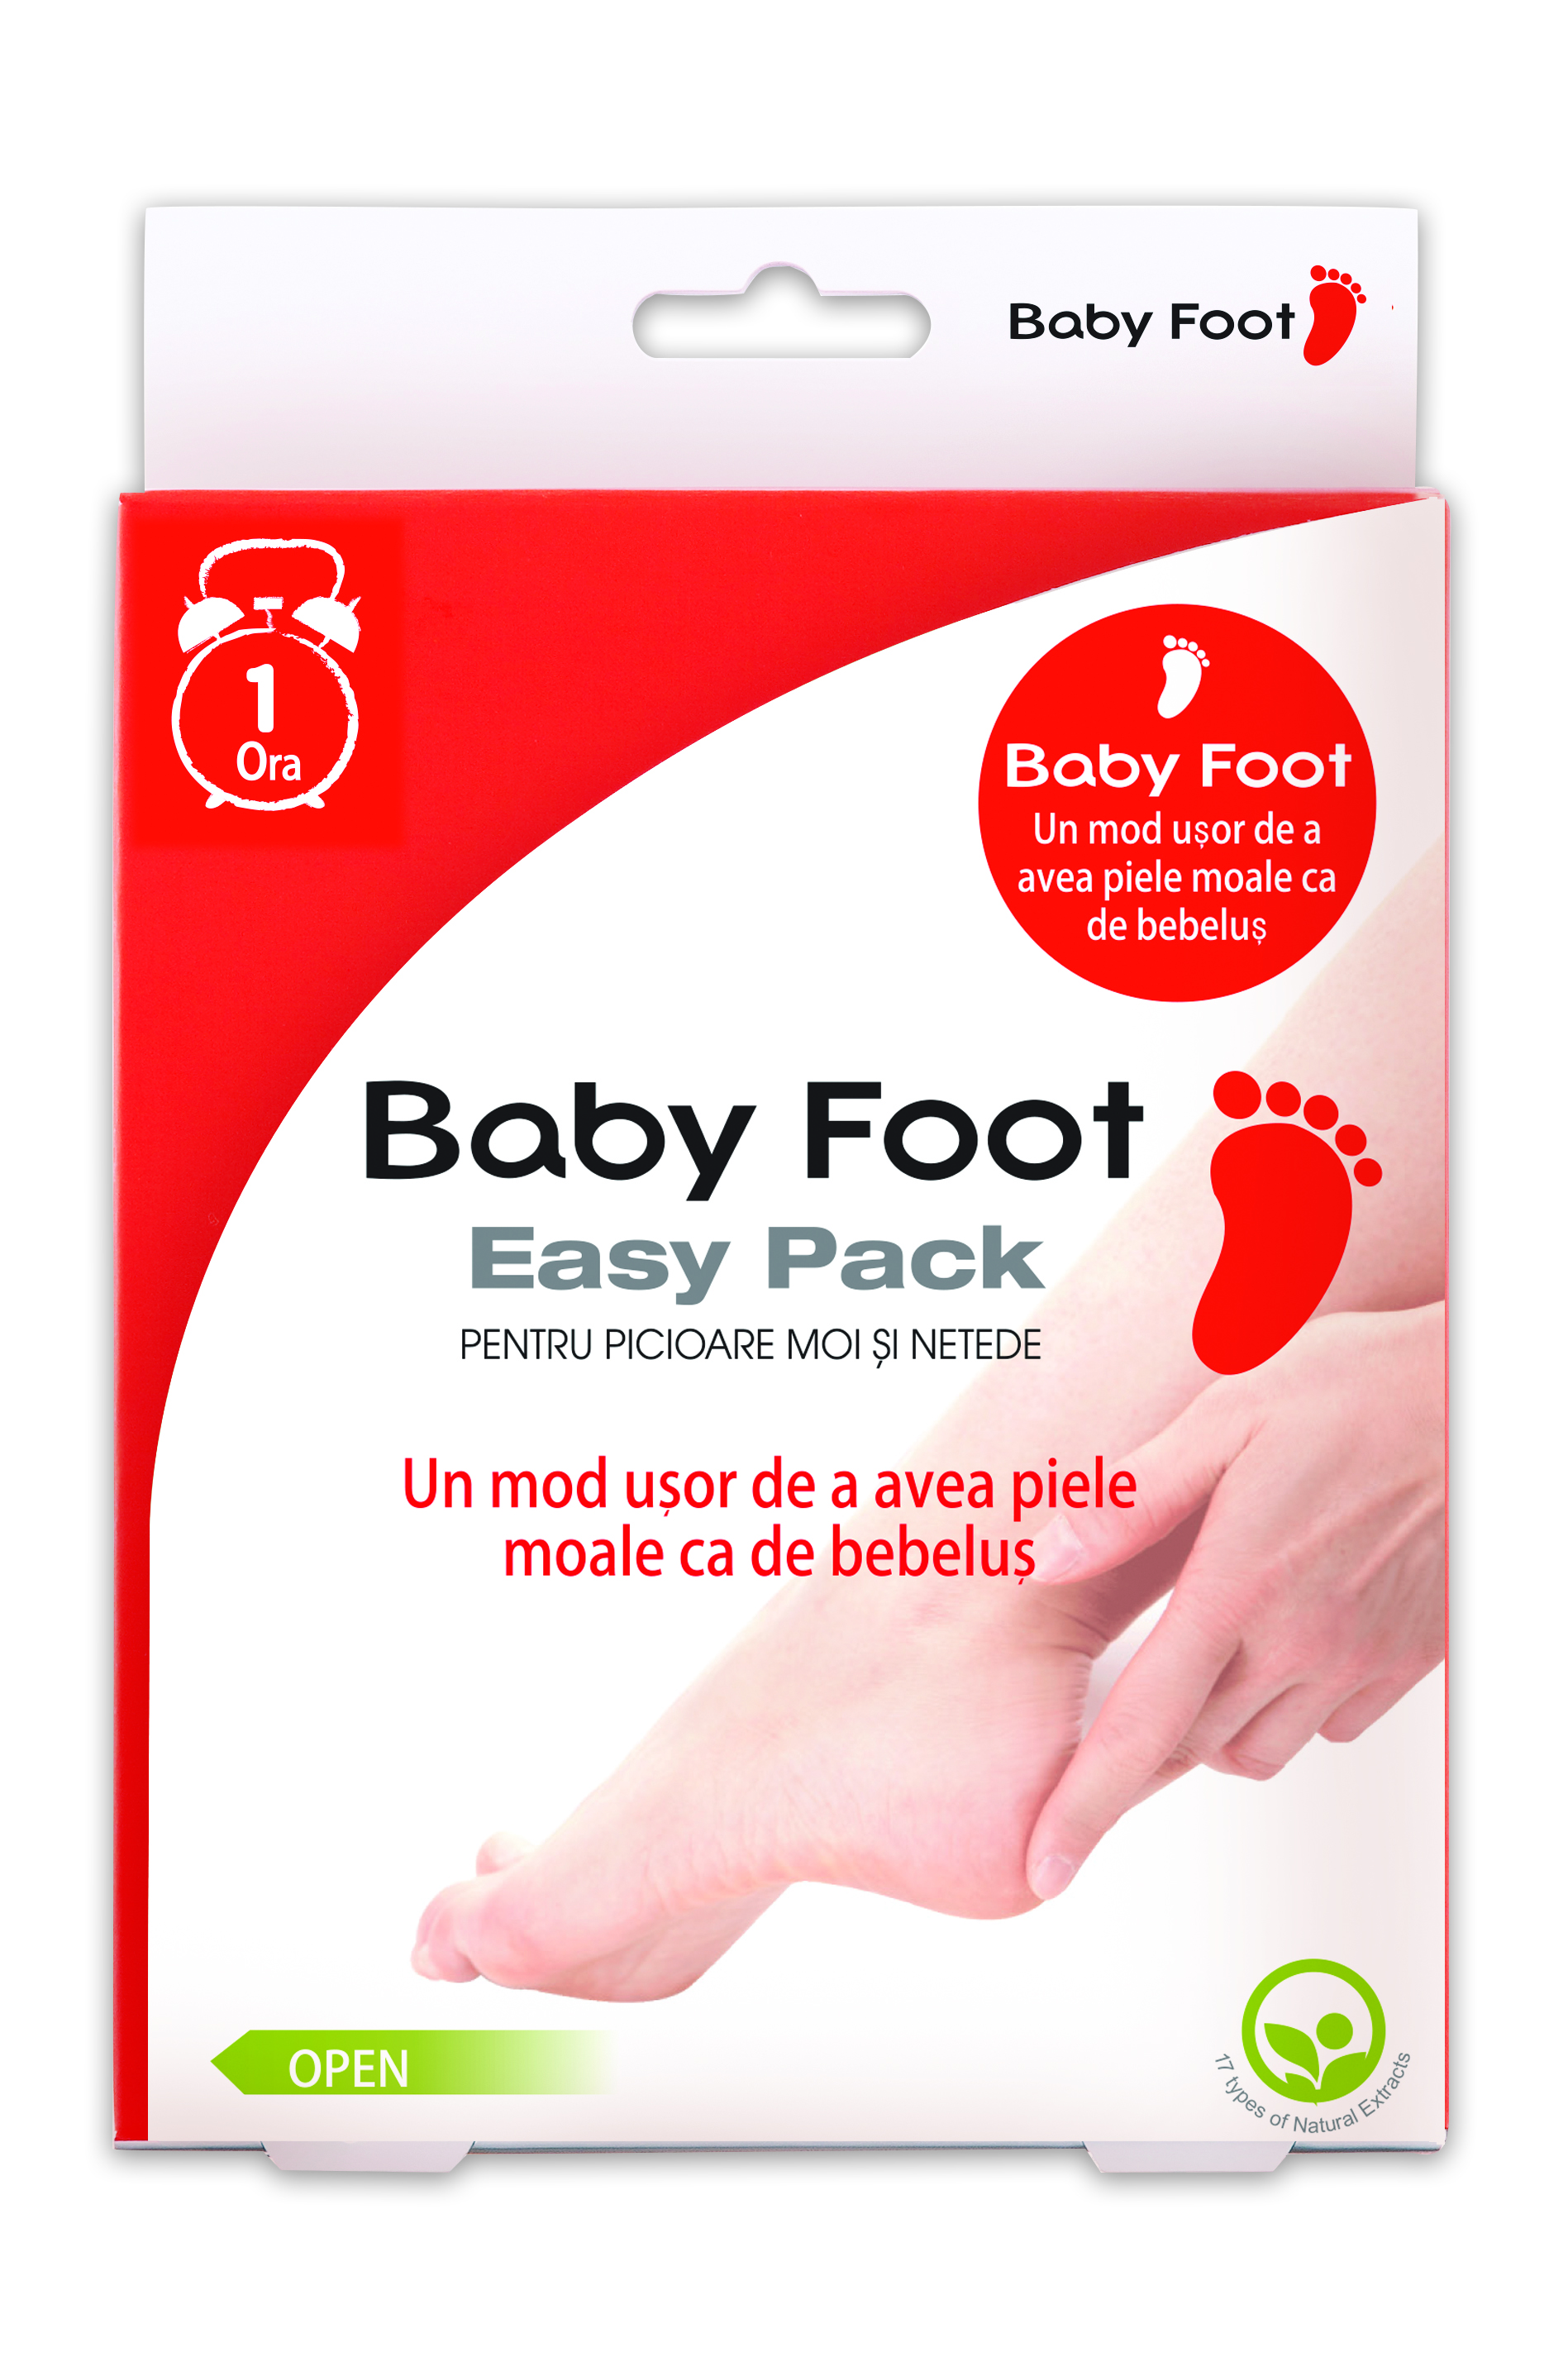 Baby foot Romania